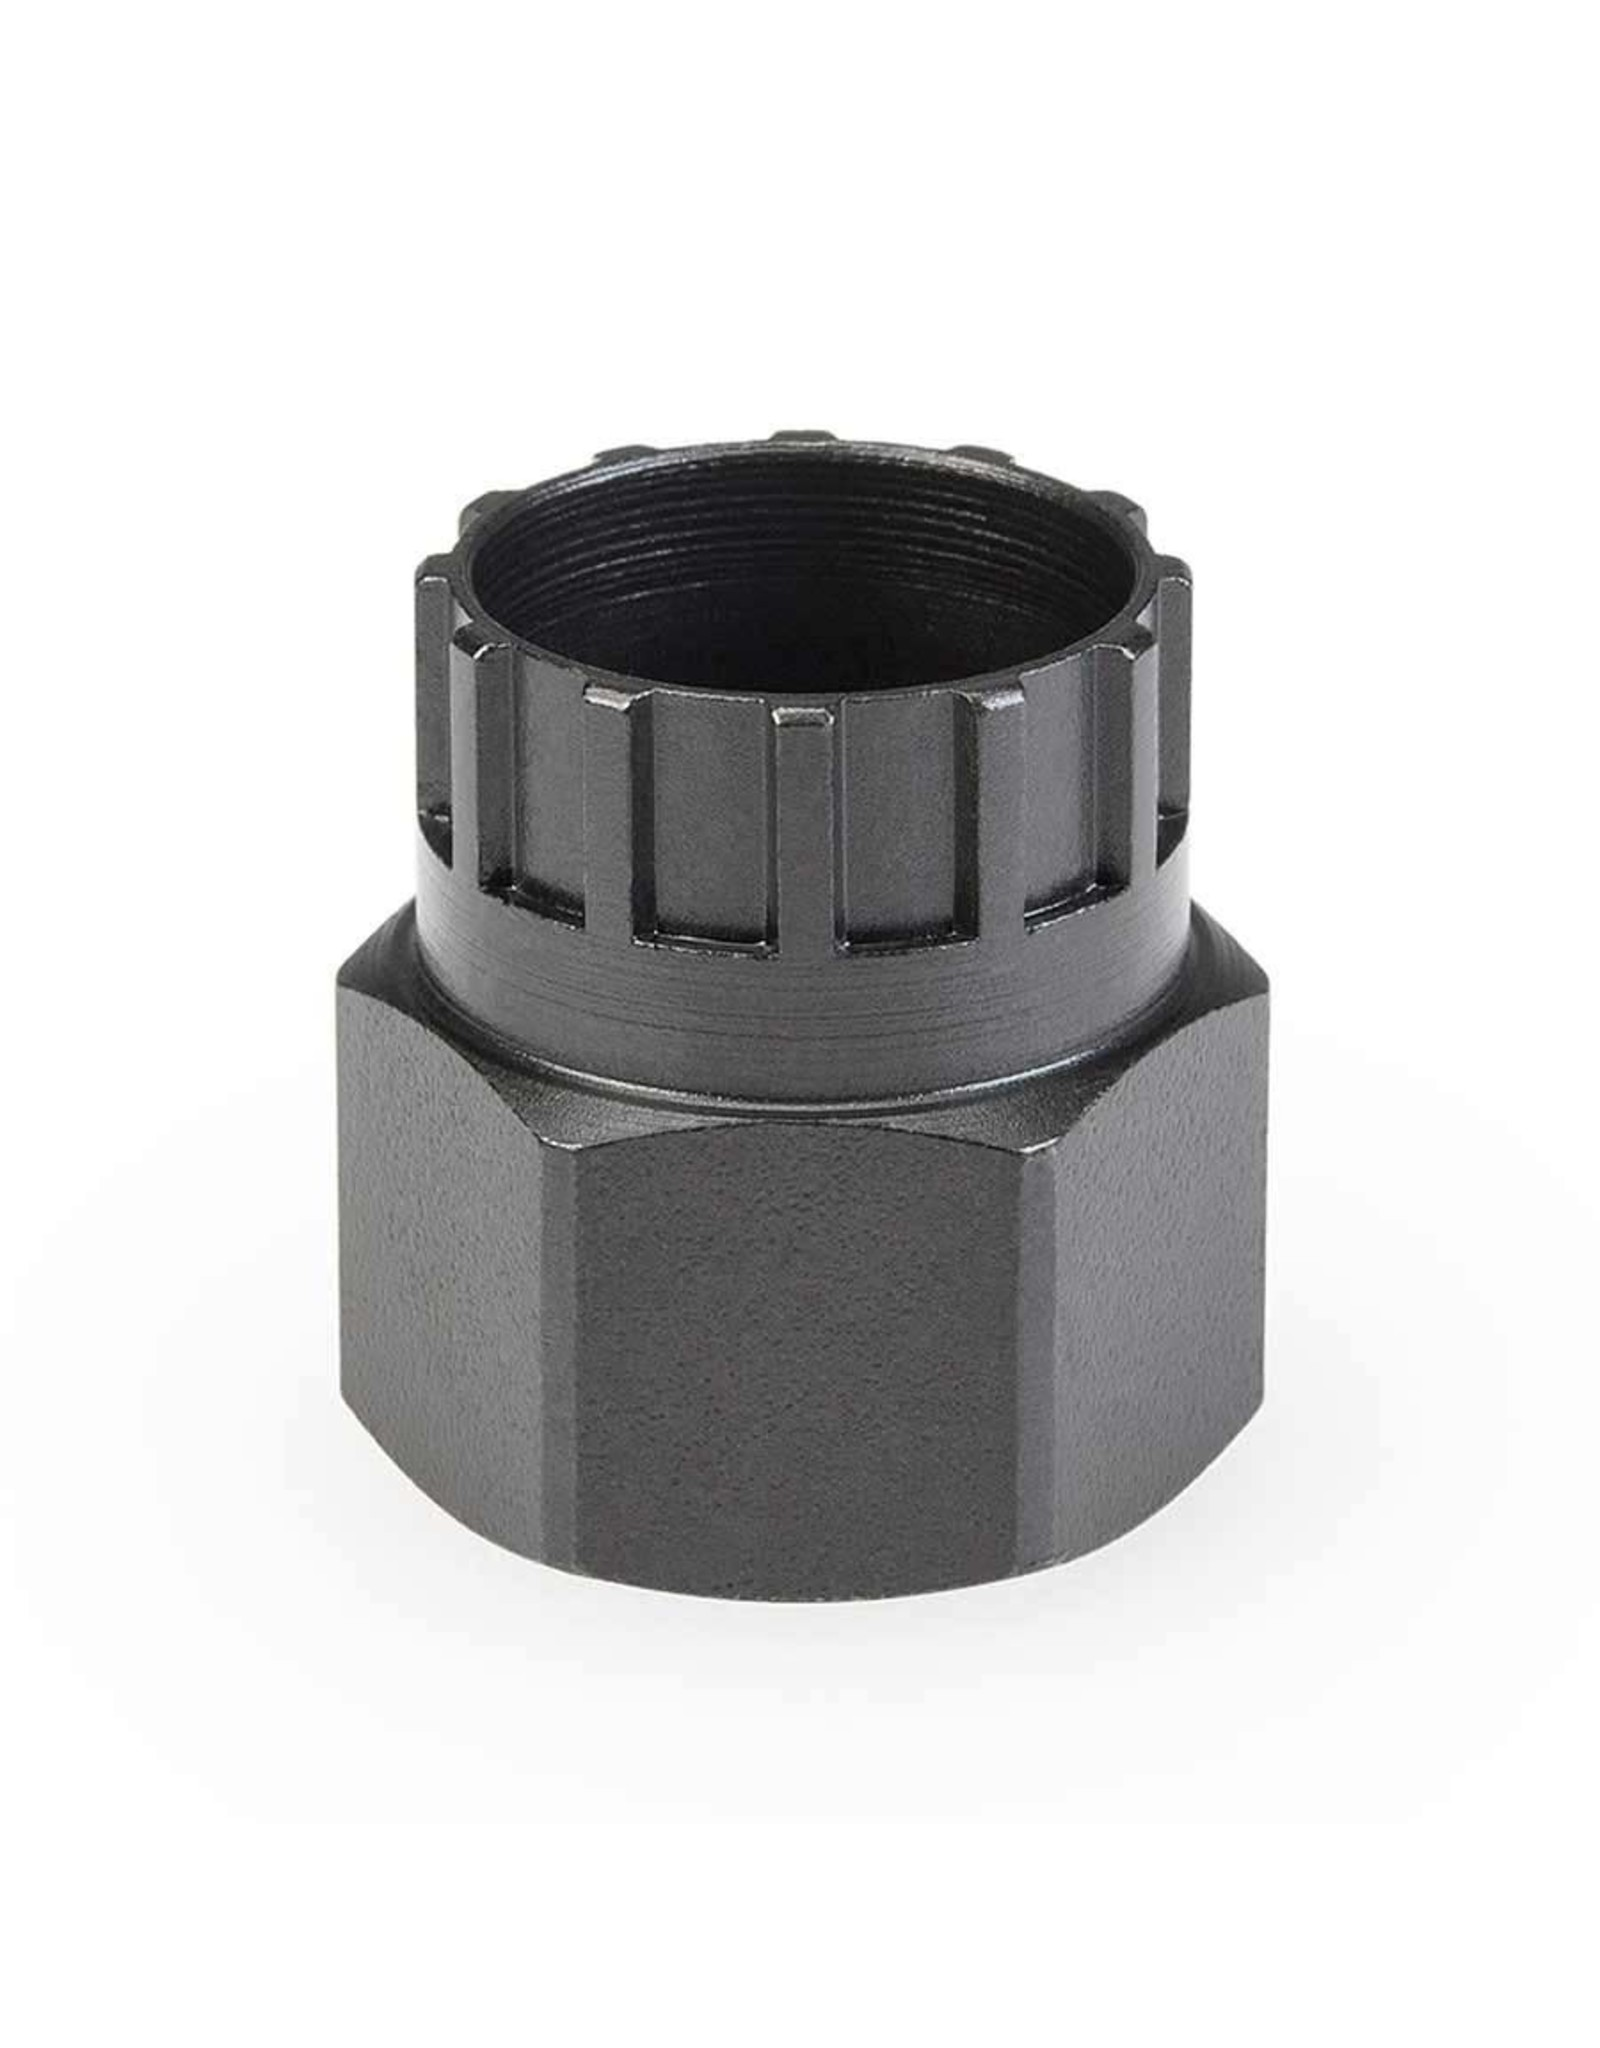 Park Tool Tool - Park Tool FR-5.2, Cassette Lockring Remover